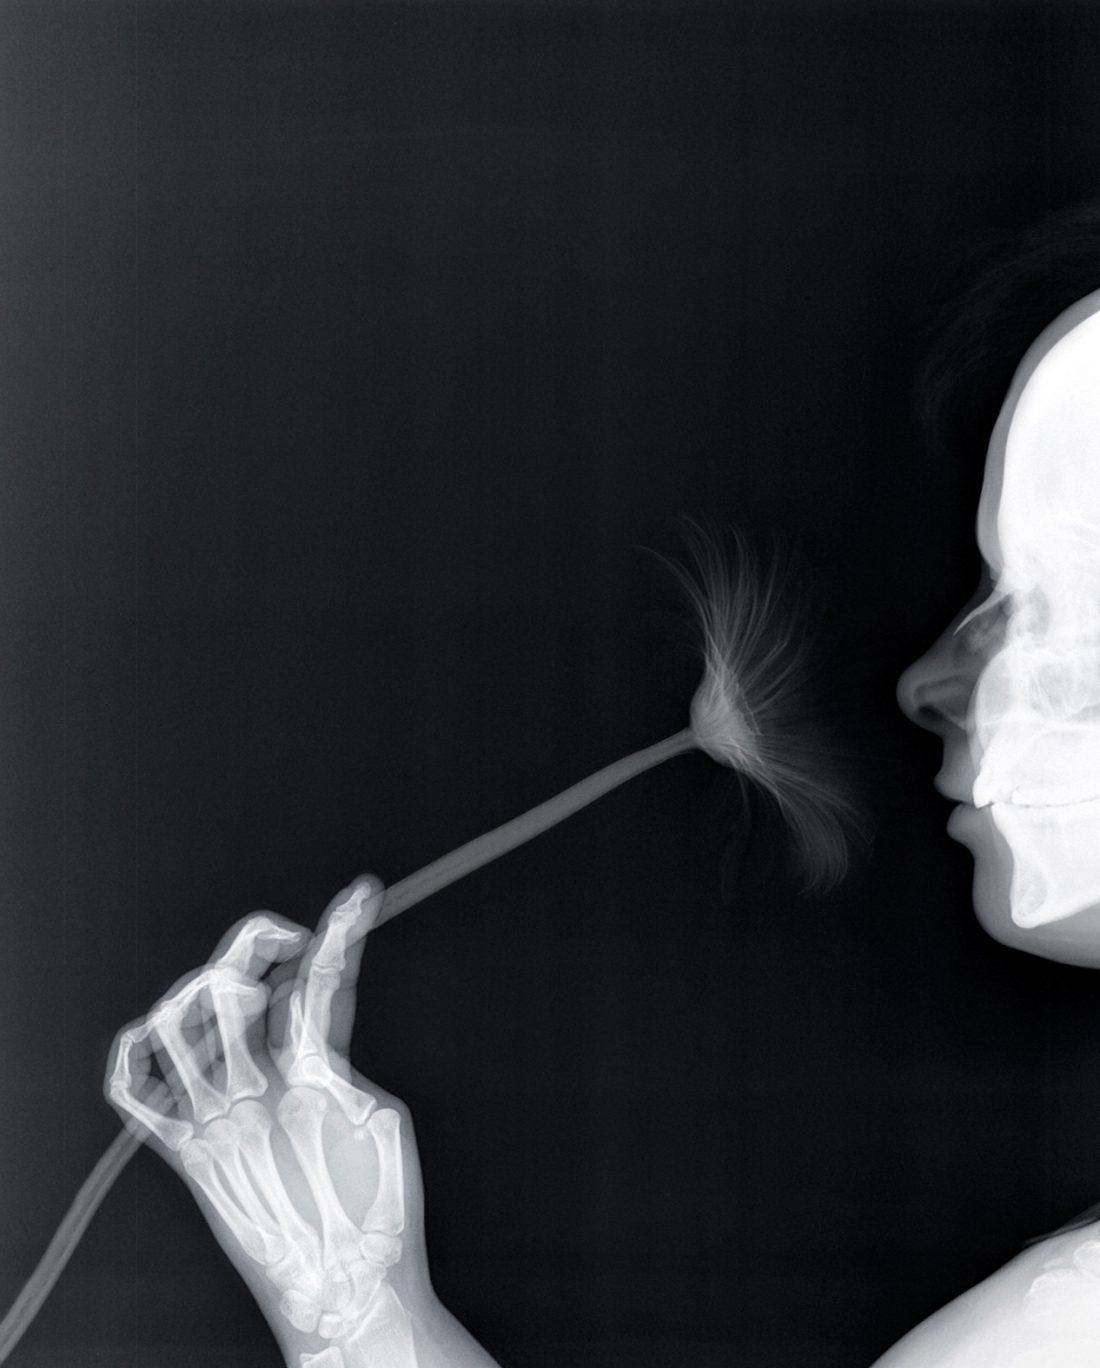 Grotesque & Arabesque (Profile with Gerbera), x-ray, light box, 42,5 x 52,5 cm